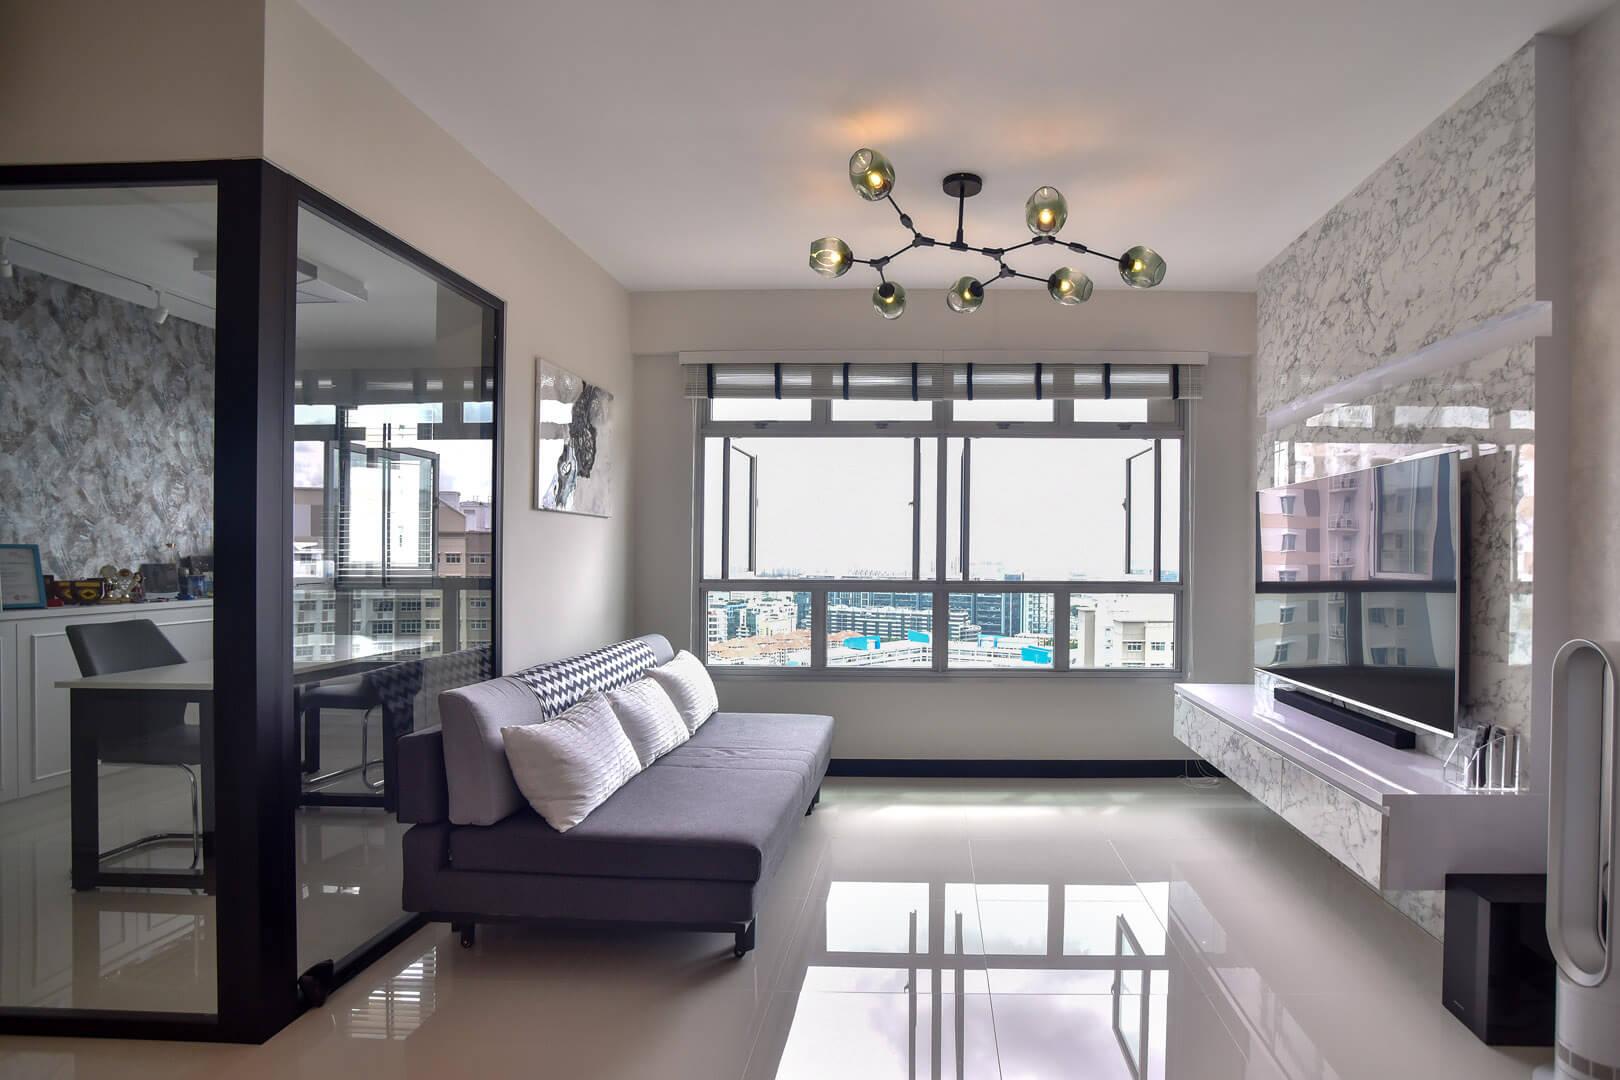 White Monochrome Interior Design Living Room Side View